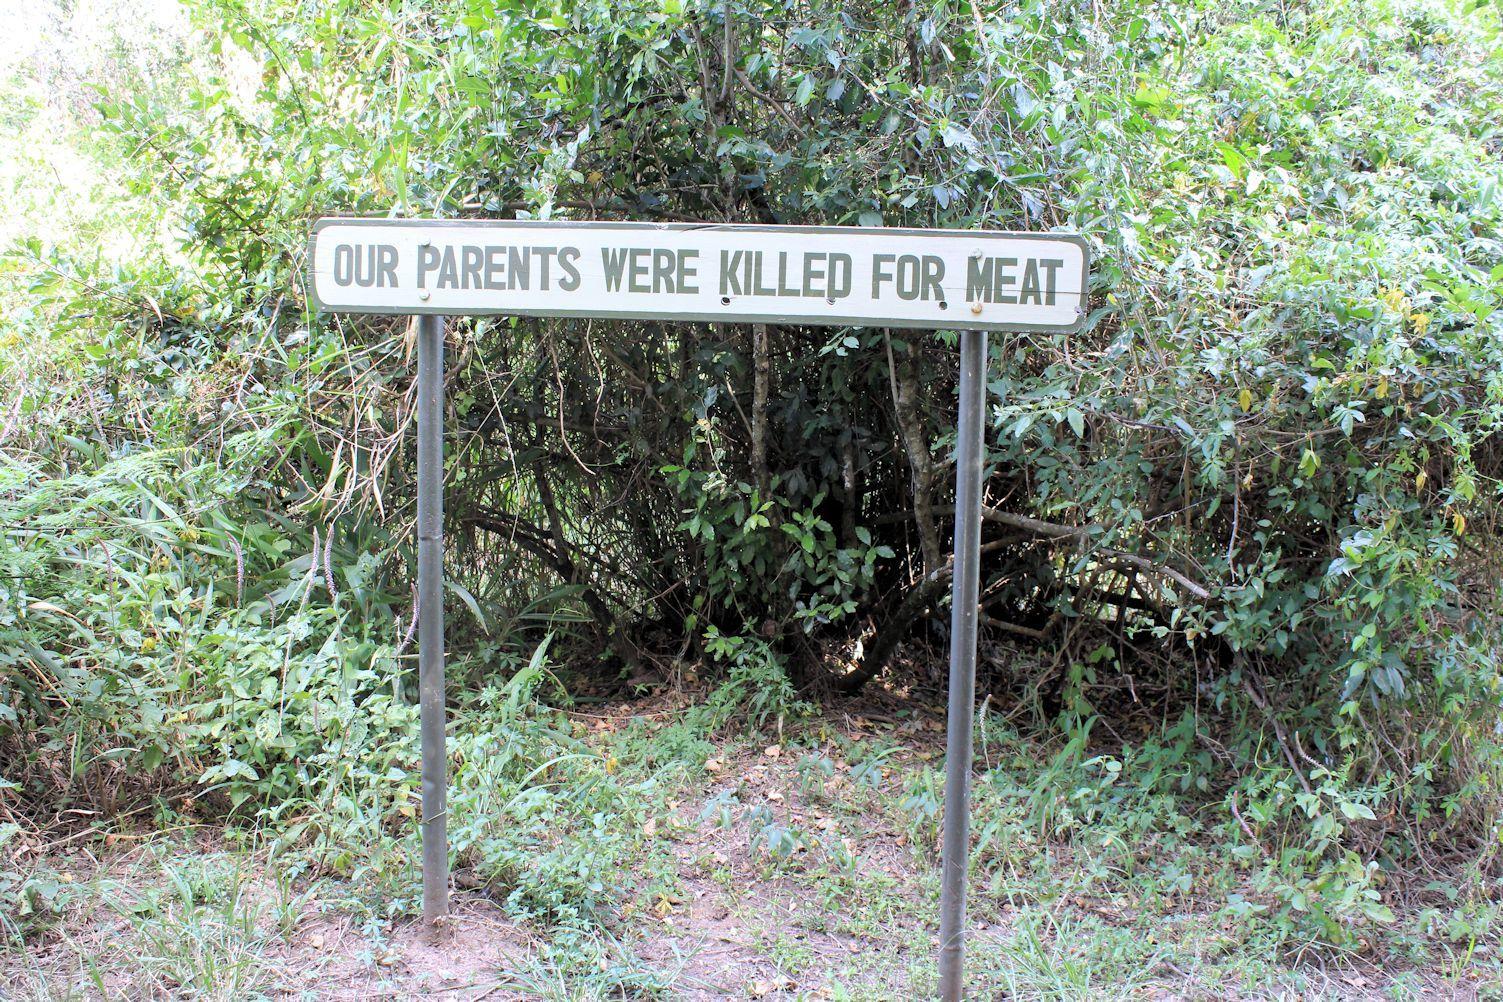 Sweetwaters Chimpanzee Sanctuary. Ol Pejeta conservancy part 2